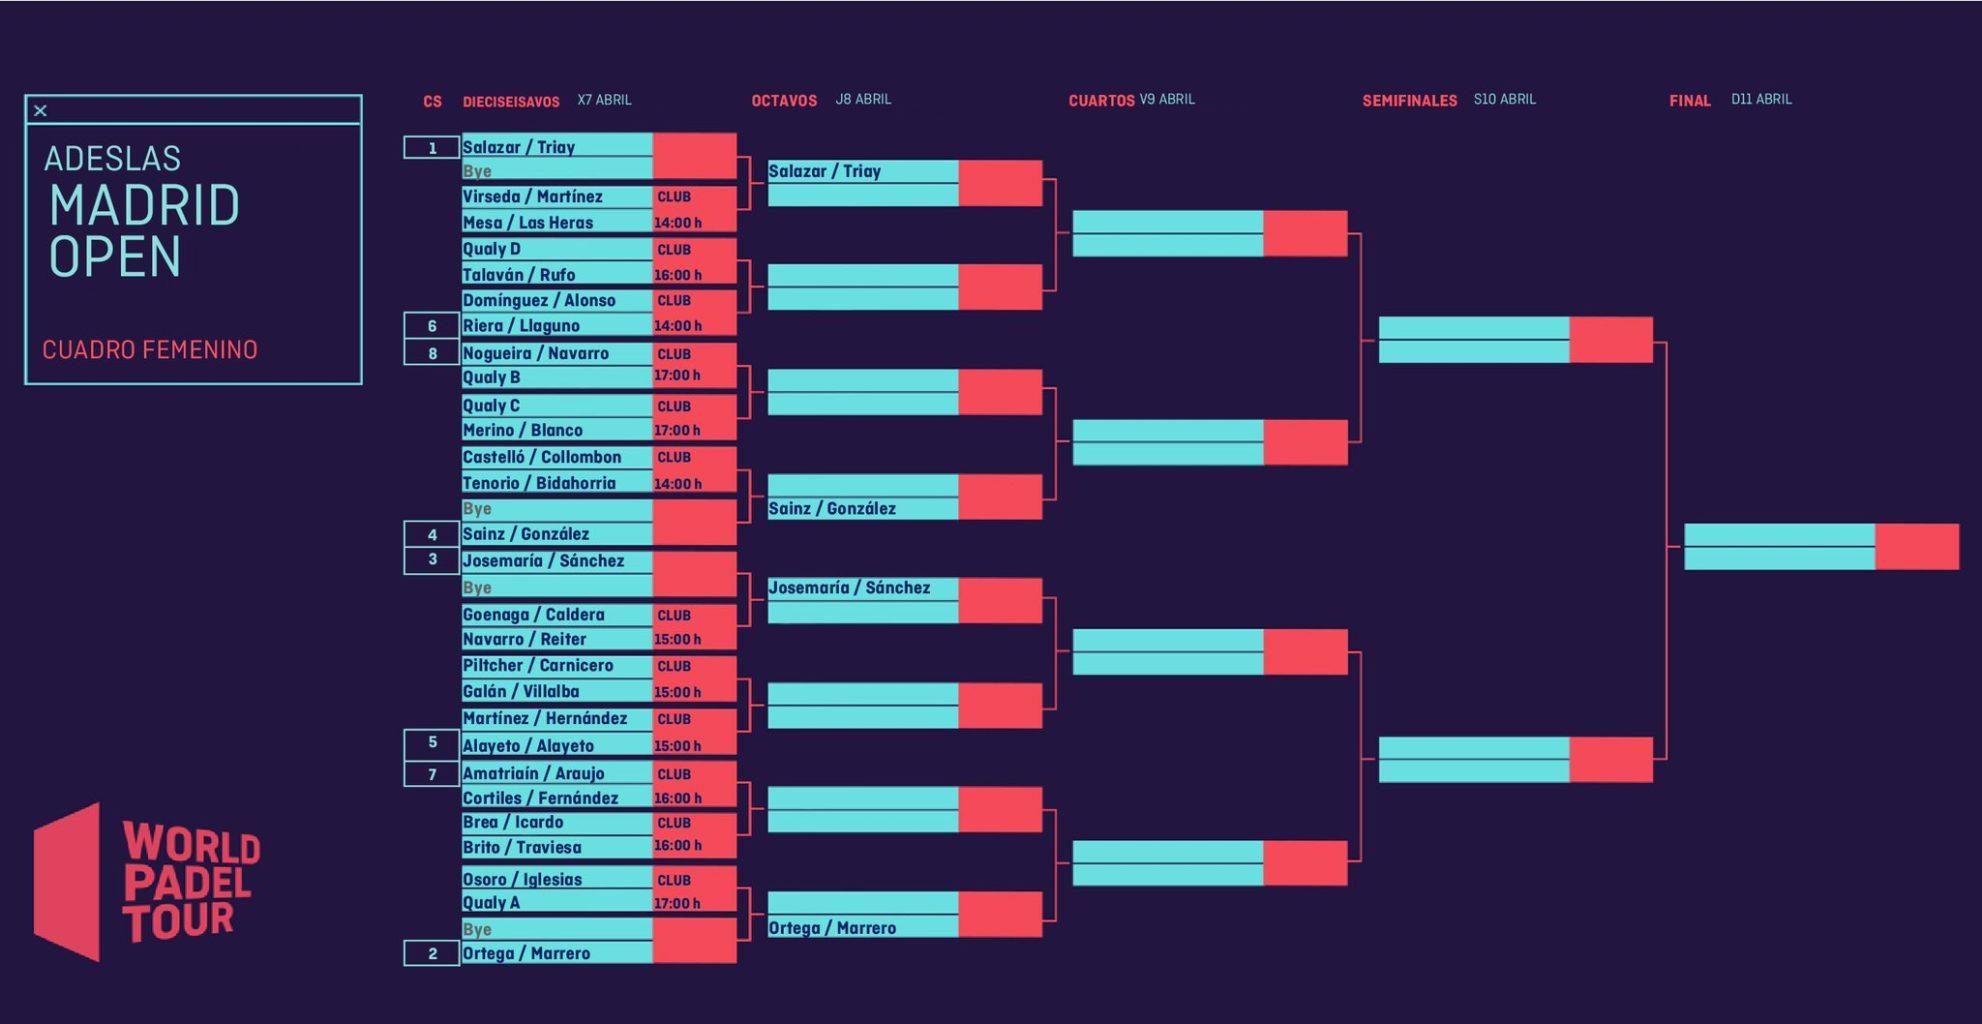 Cuadro final femenino del Adeslas Madrid Open 2021